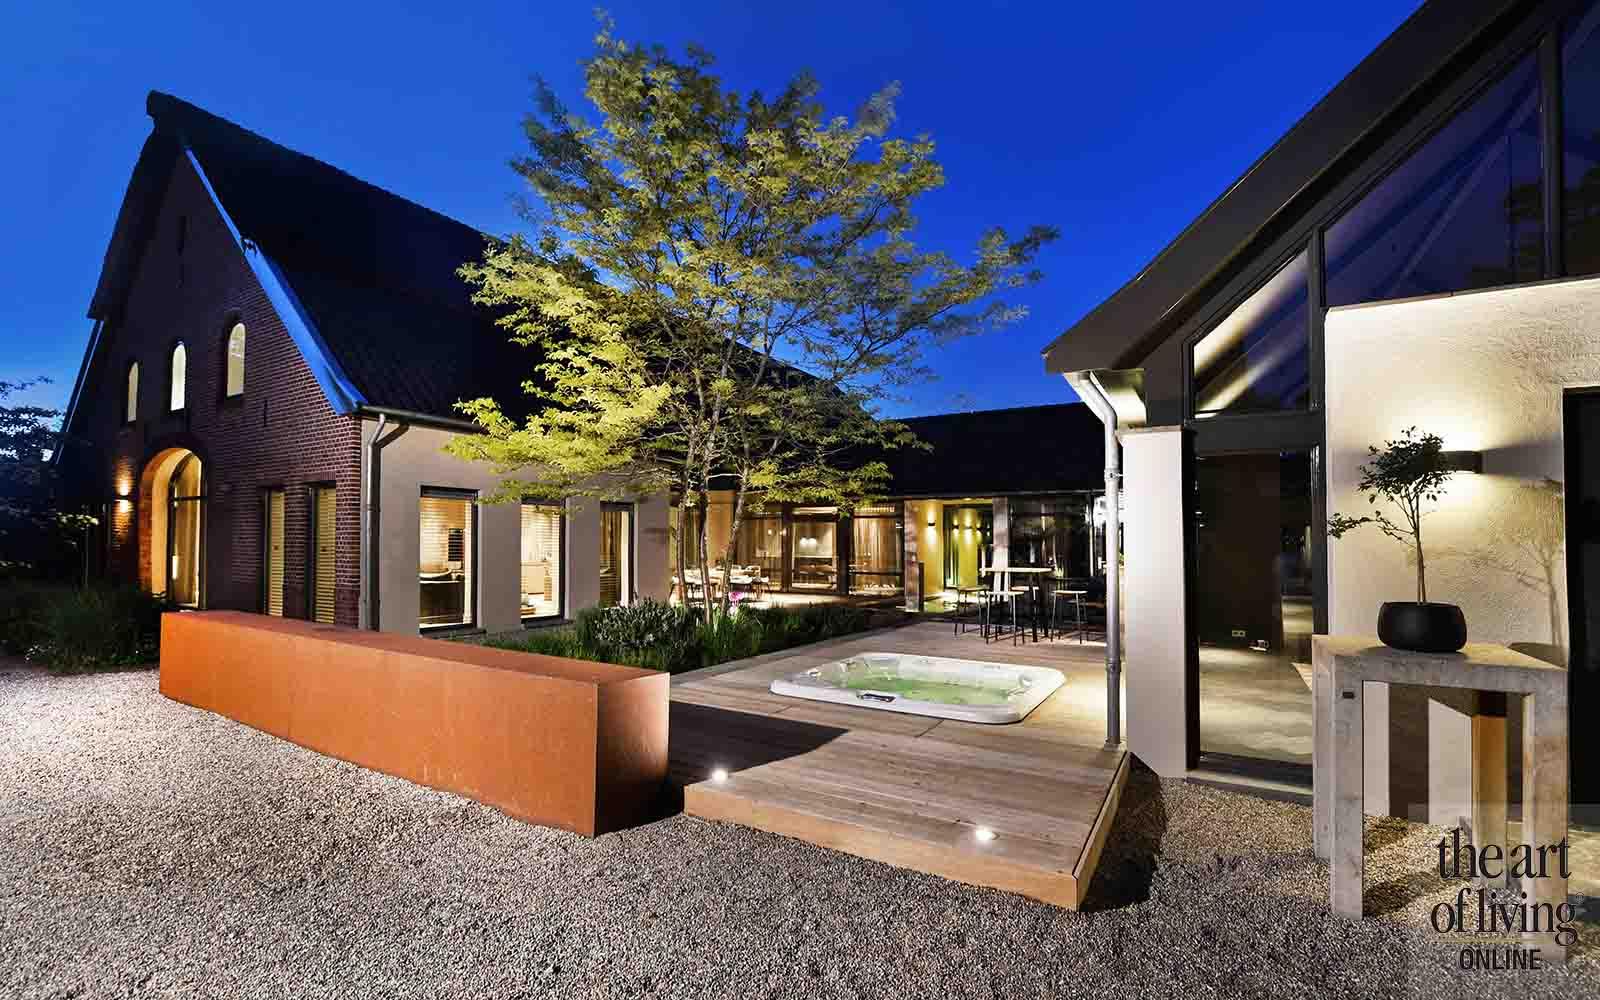 Woonboerderij | Coce, the art of living